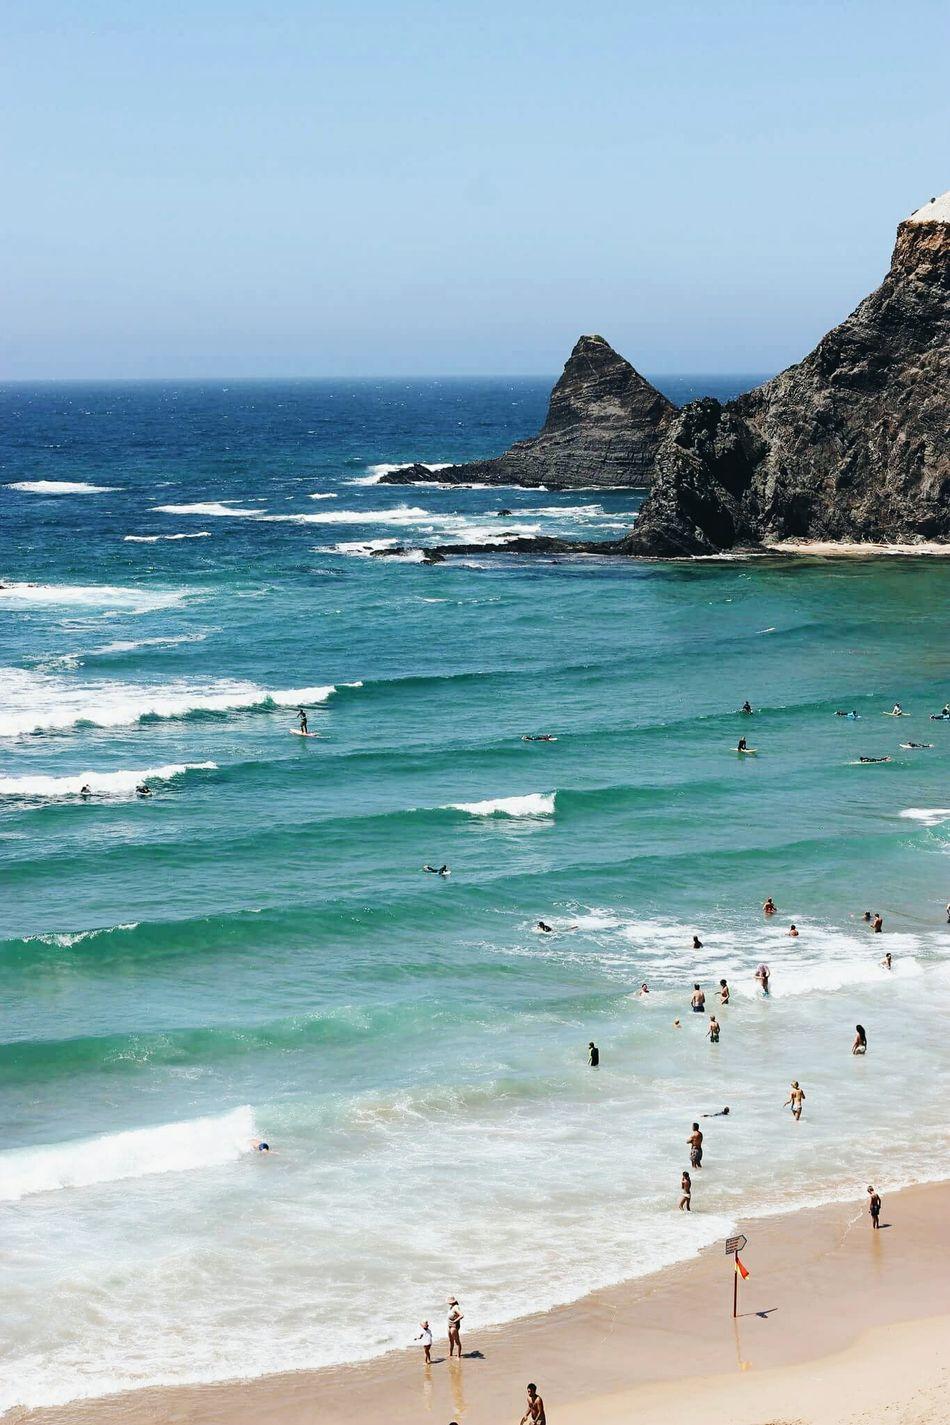 You just can't go wrong with an ocean like this. Odeceixe Ocean Blue Shore Ocean Photography Beach Summer Views